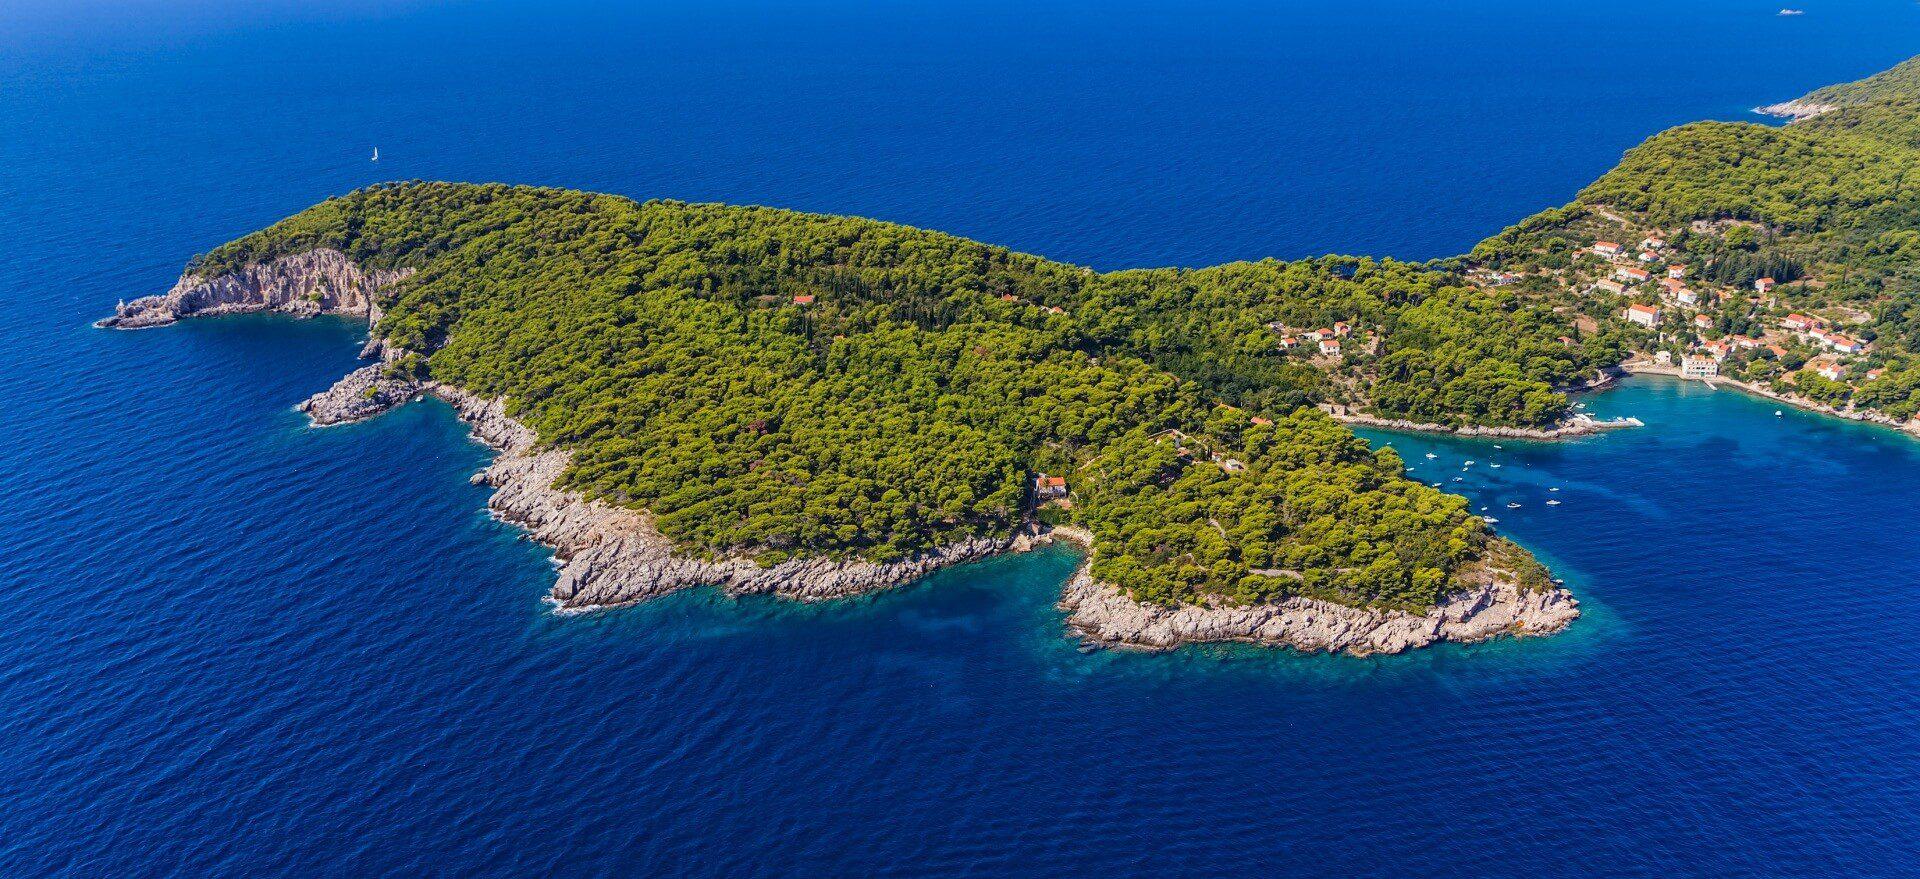 Elaphite islands - Kalamota